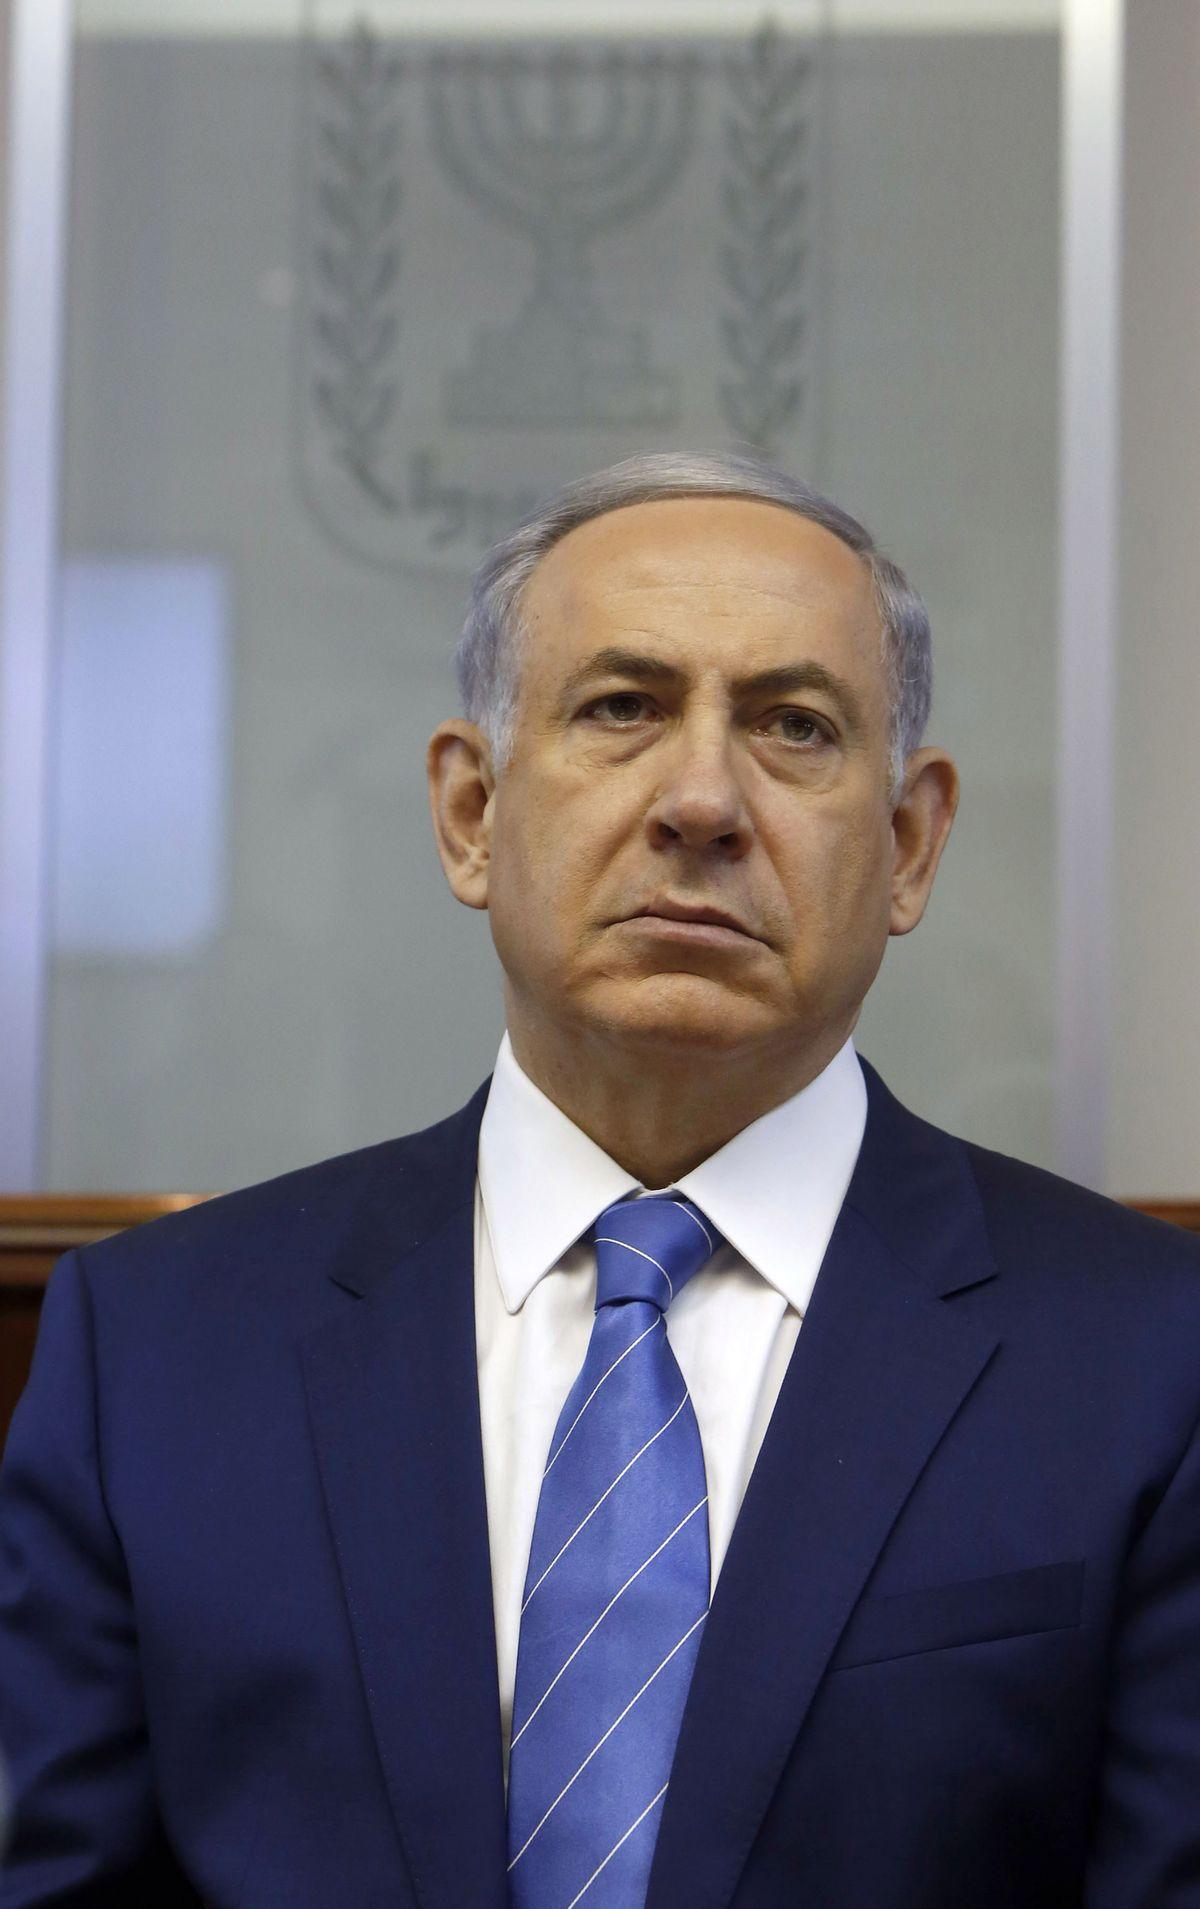 Israel's Prime Minister Benjamin Netanyahu chairs the weekly cabinet meeting in Jerusalem, Sunday, Aug. 2, 2015. (Gali Tibbon/Pool Photo via AP) (AP)